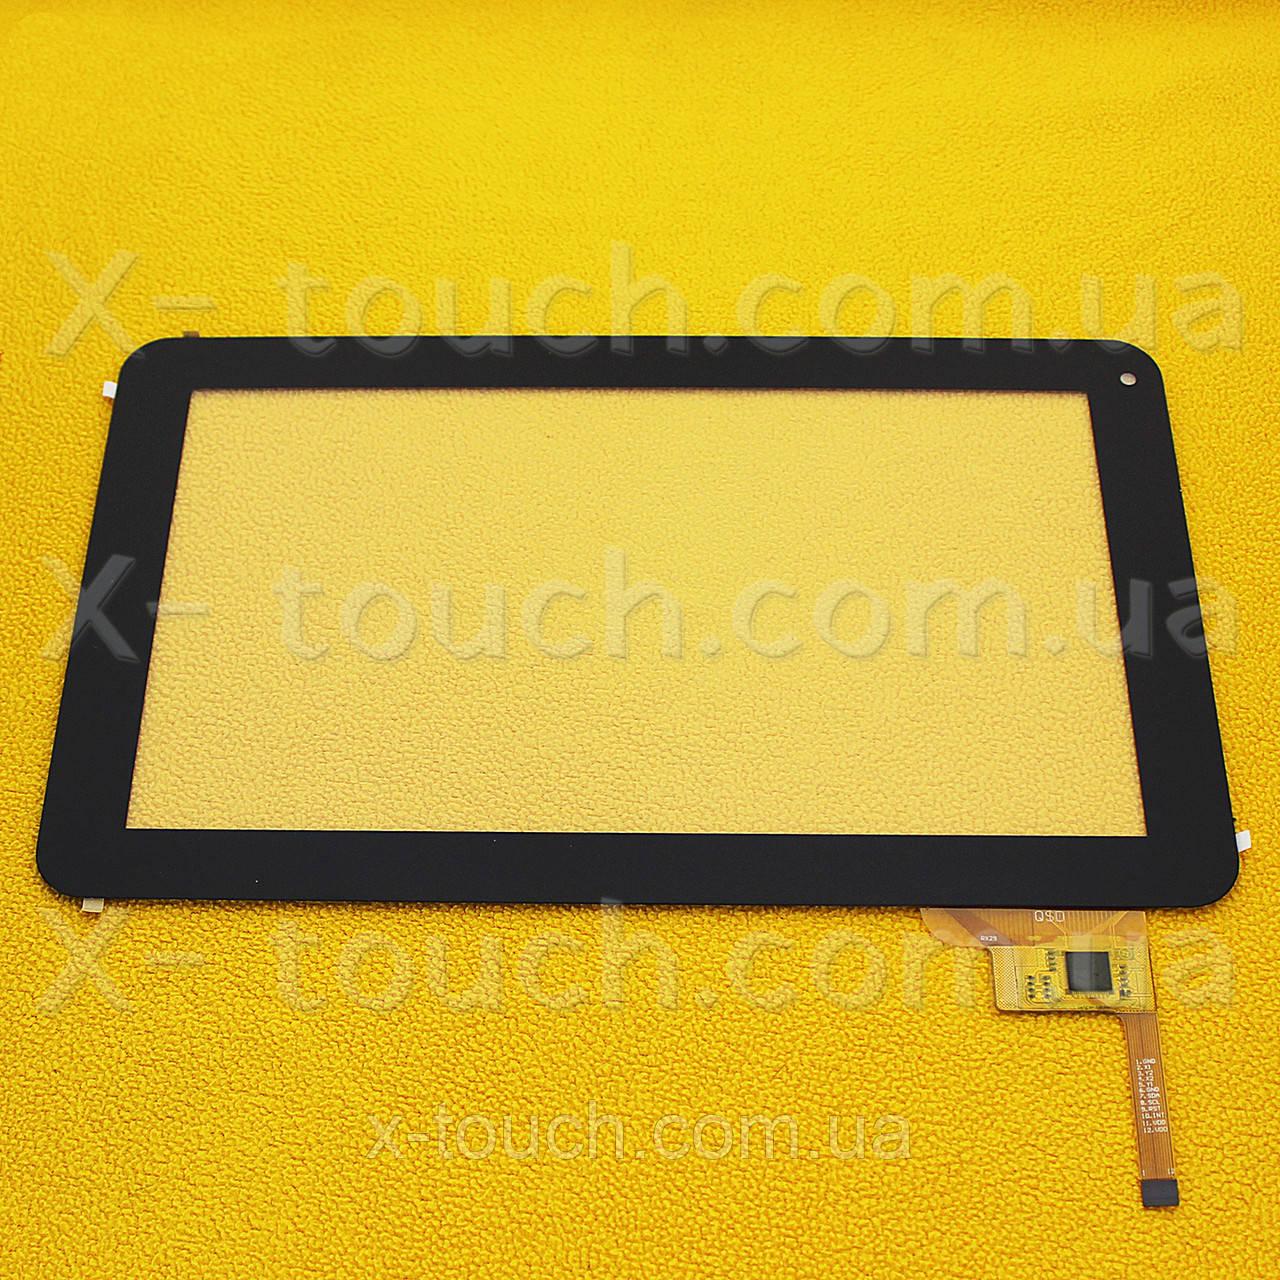 Тачскрин, сенсор  E-C97008-02  для планшета